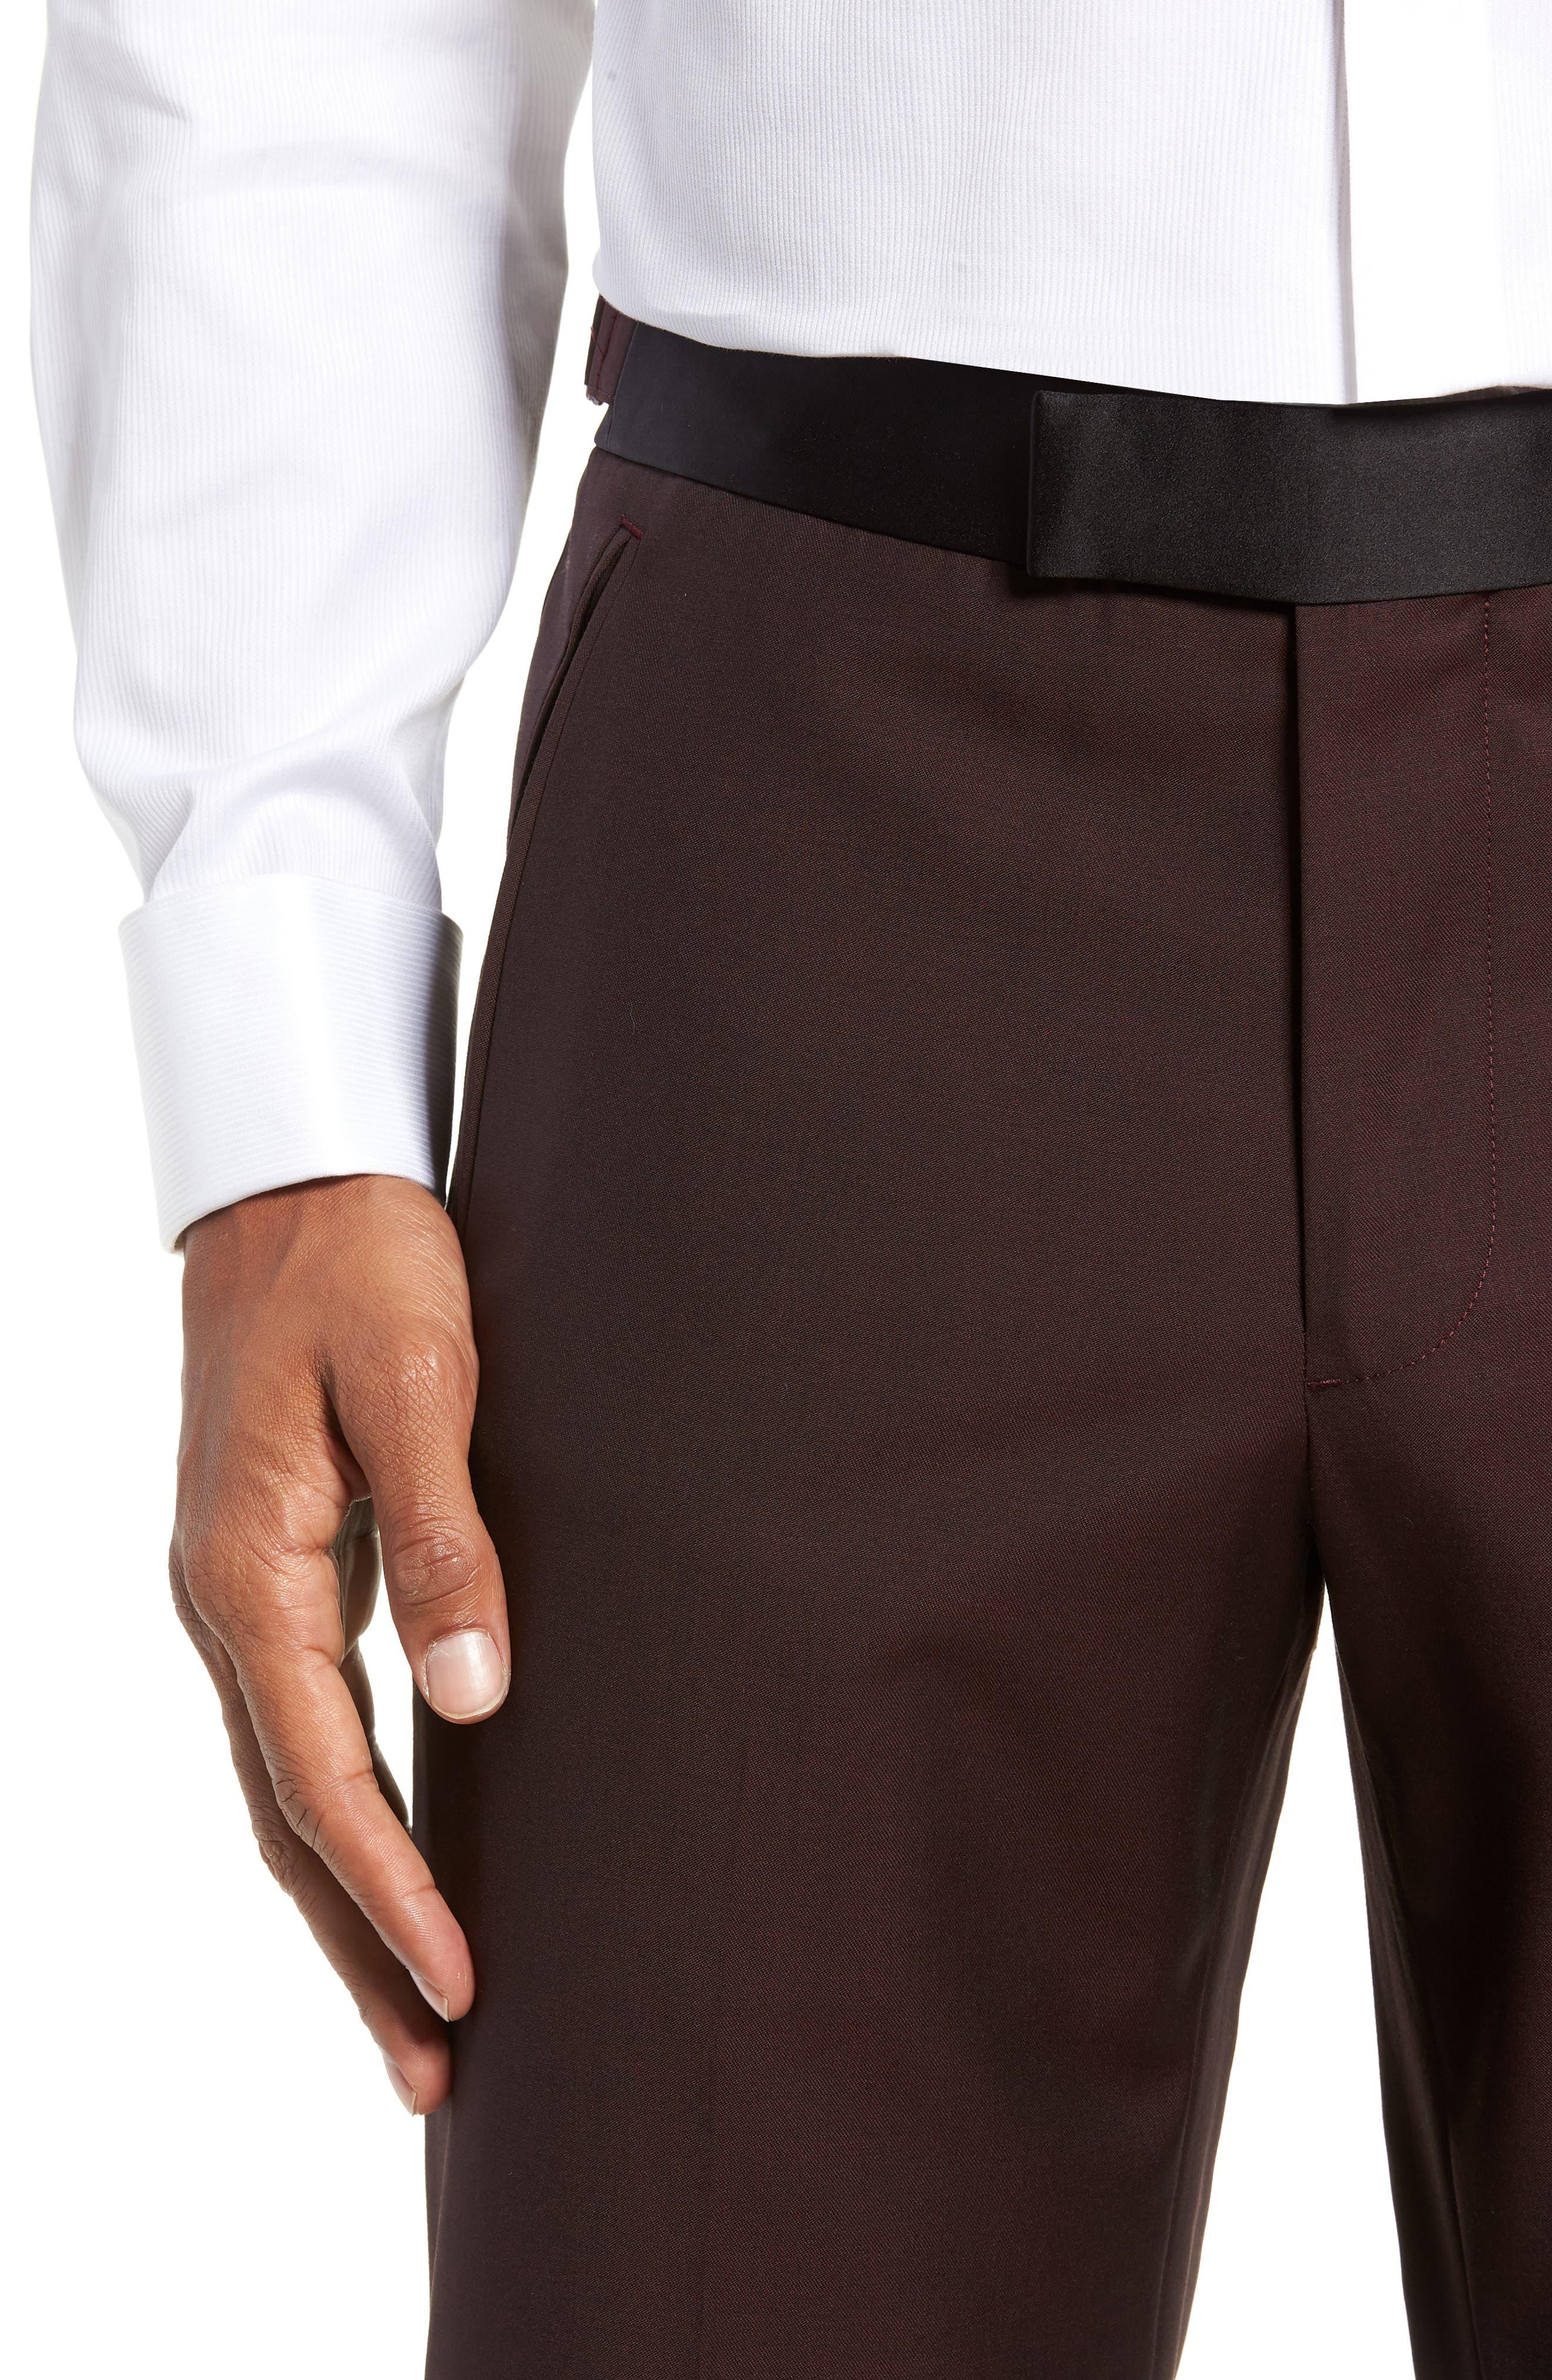 Capstone Slim Fit Tuxedo Trousers,                             Alternate thumbnail 4, color,                             MAROON